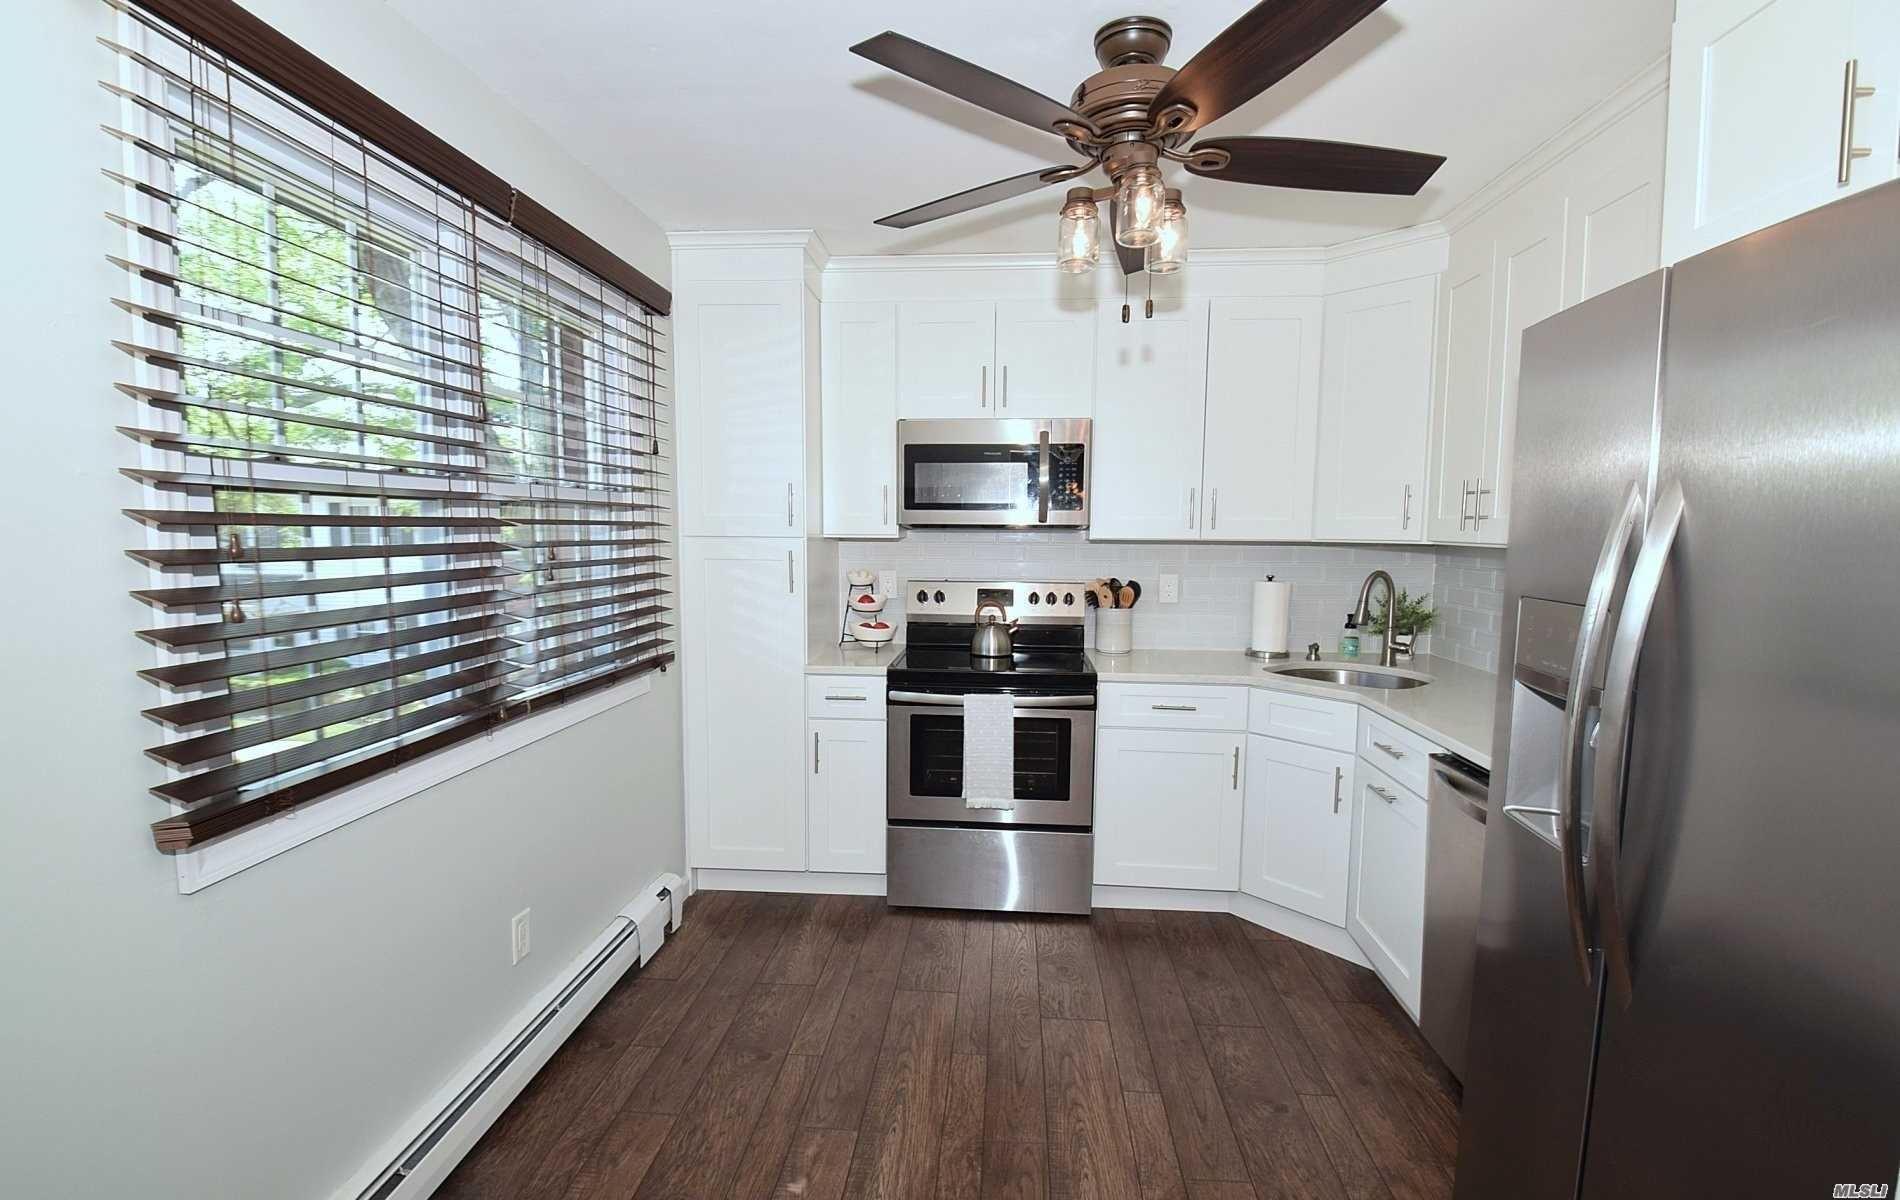 31 Springwood Drive, North Babylon, NY 11703 - MLS#: 3231665